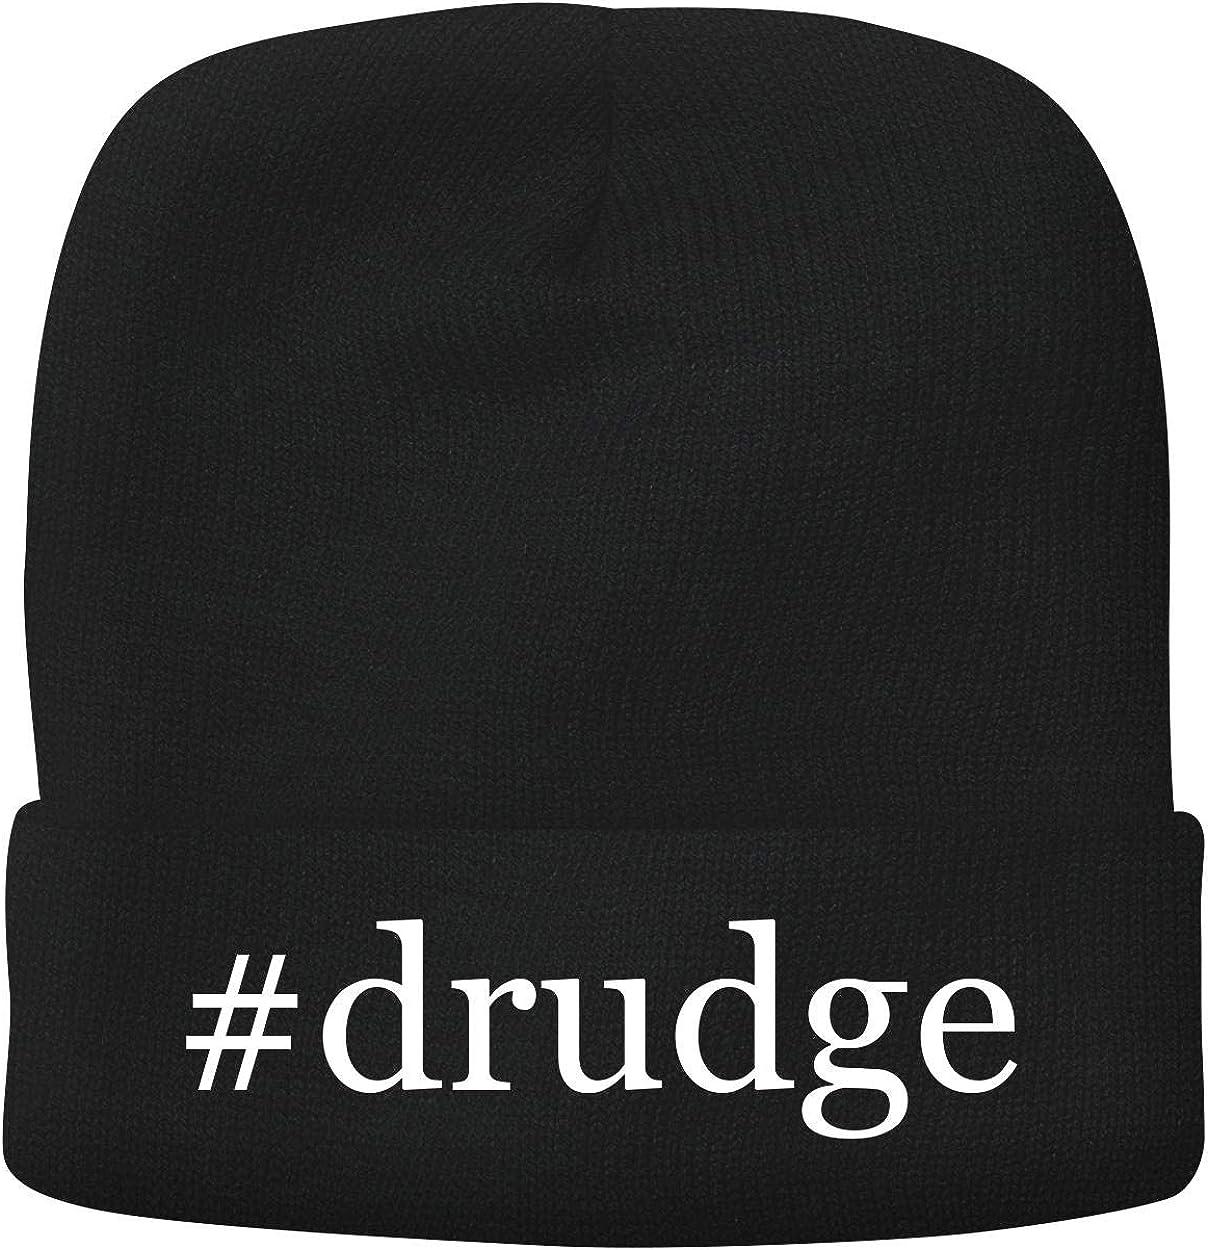 BH Cool Designs #Drudge Comfortable Dad Hat Baseball Cap